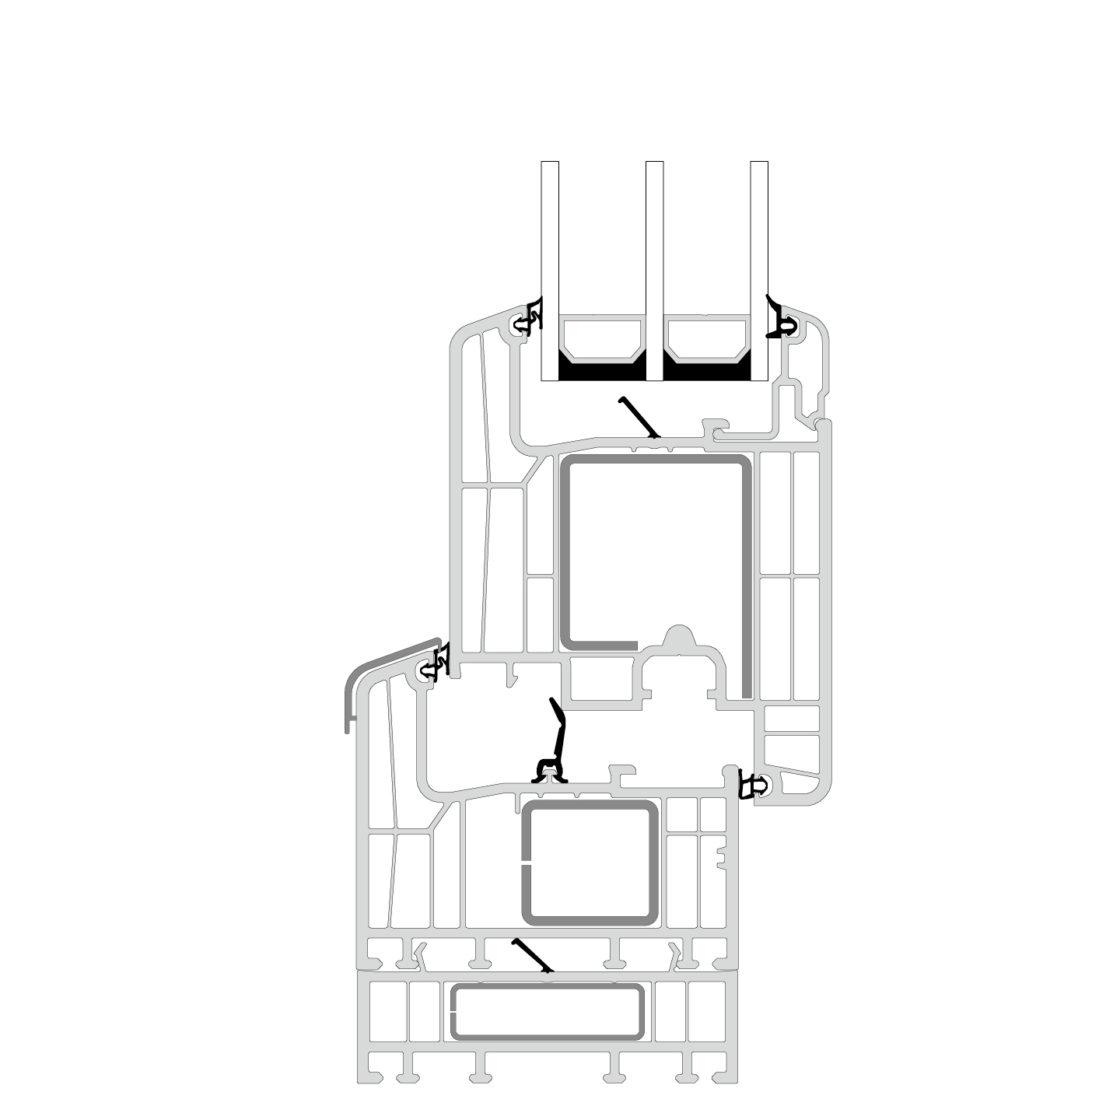 Nor Dan upvc door profile E Passive folding